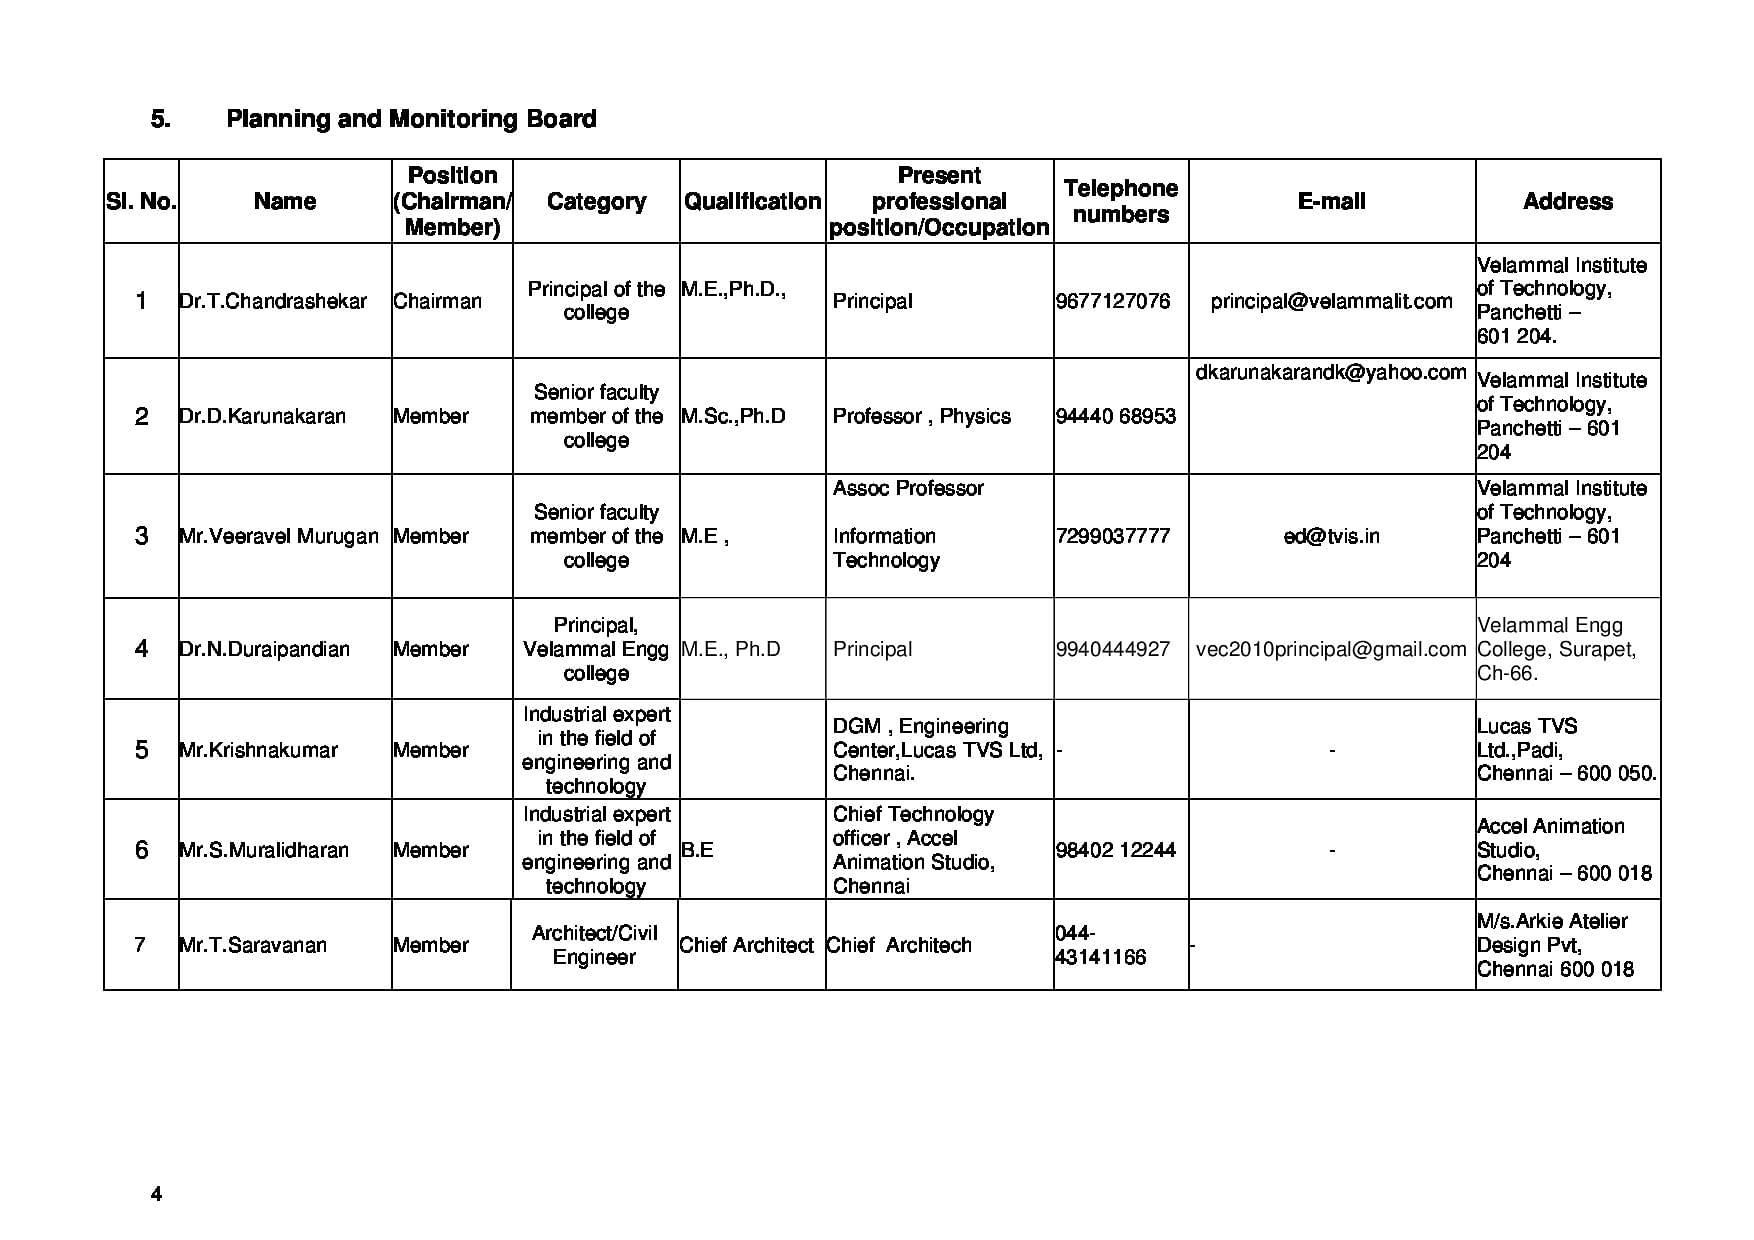 Velammal Institute of Technology - [VI-Tech], Thiruvallur - Admissions, Contact, Website ...